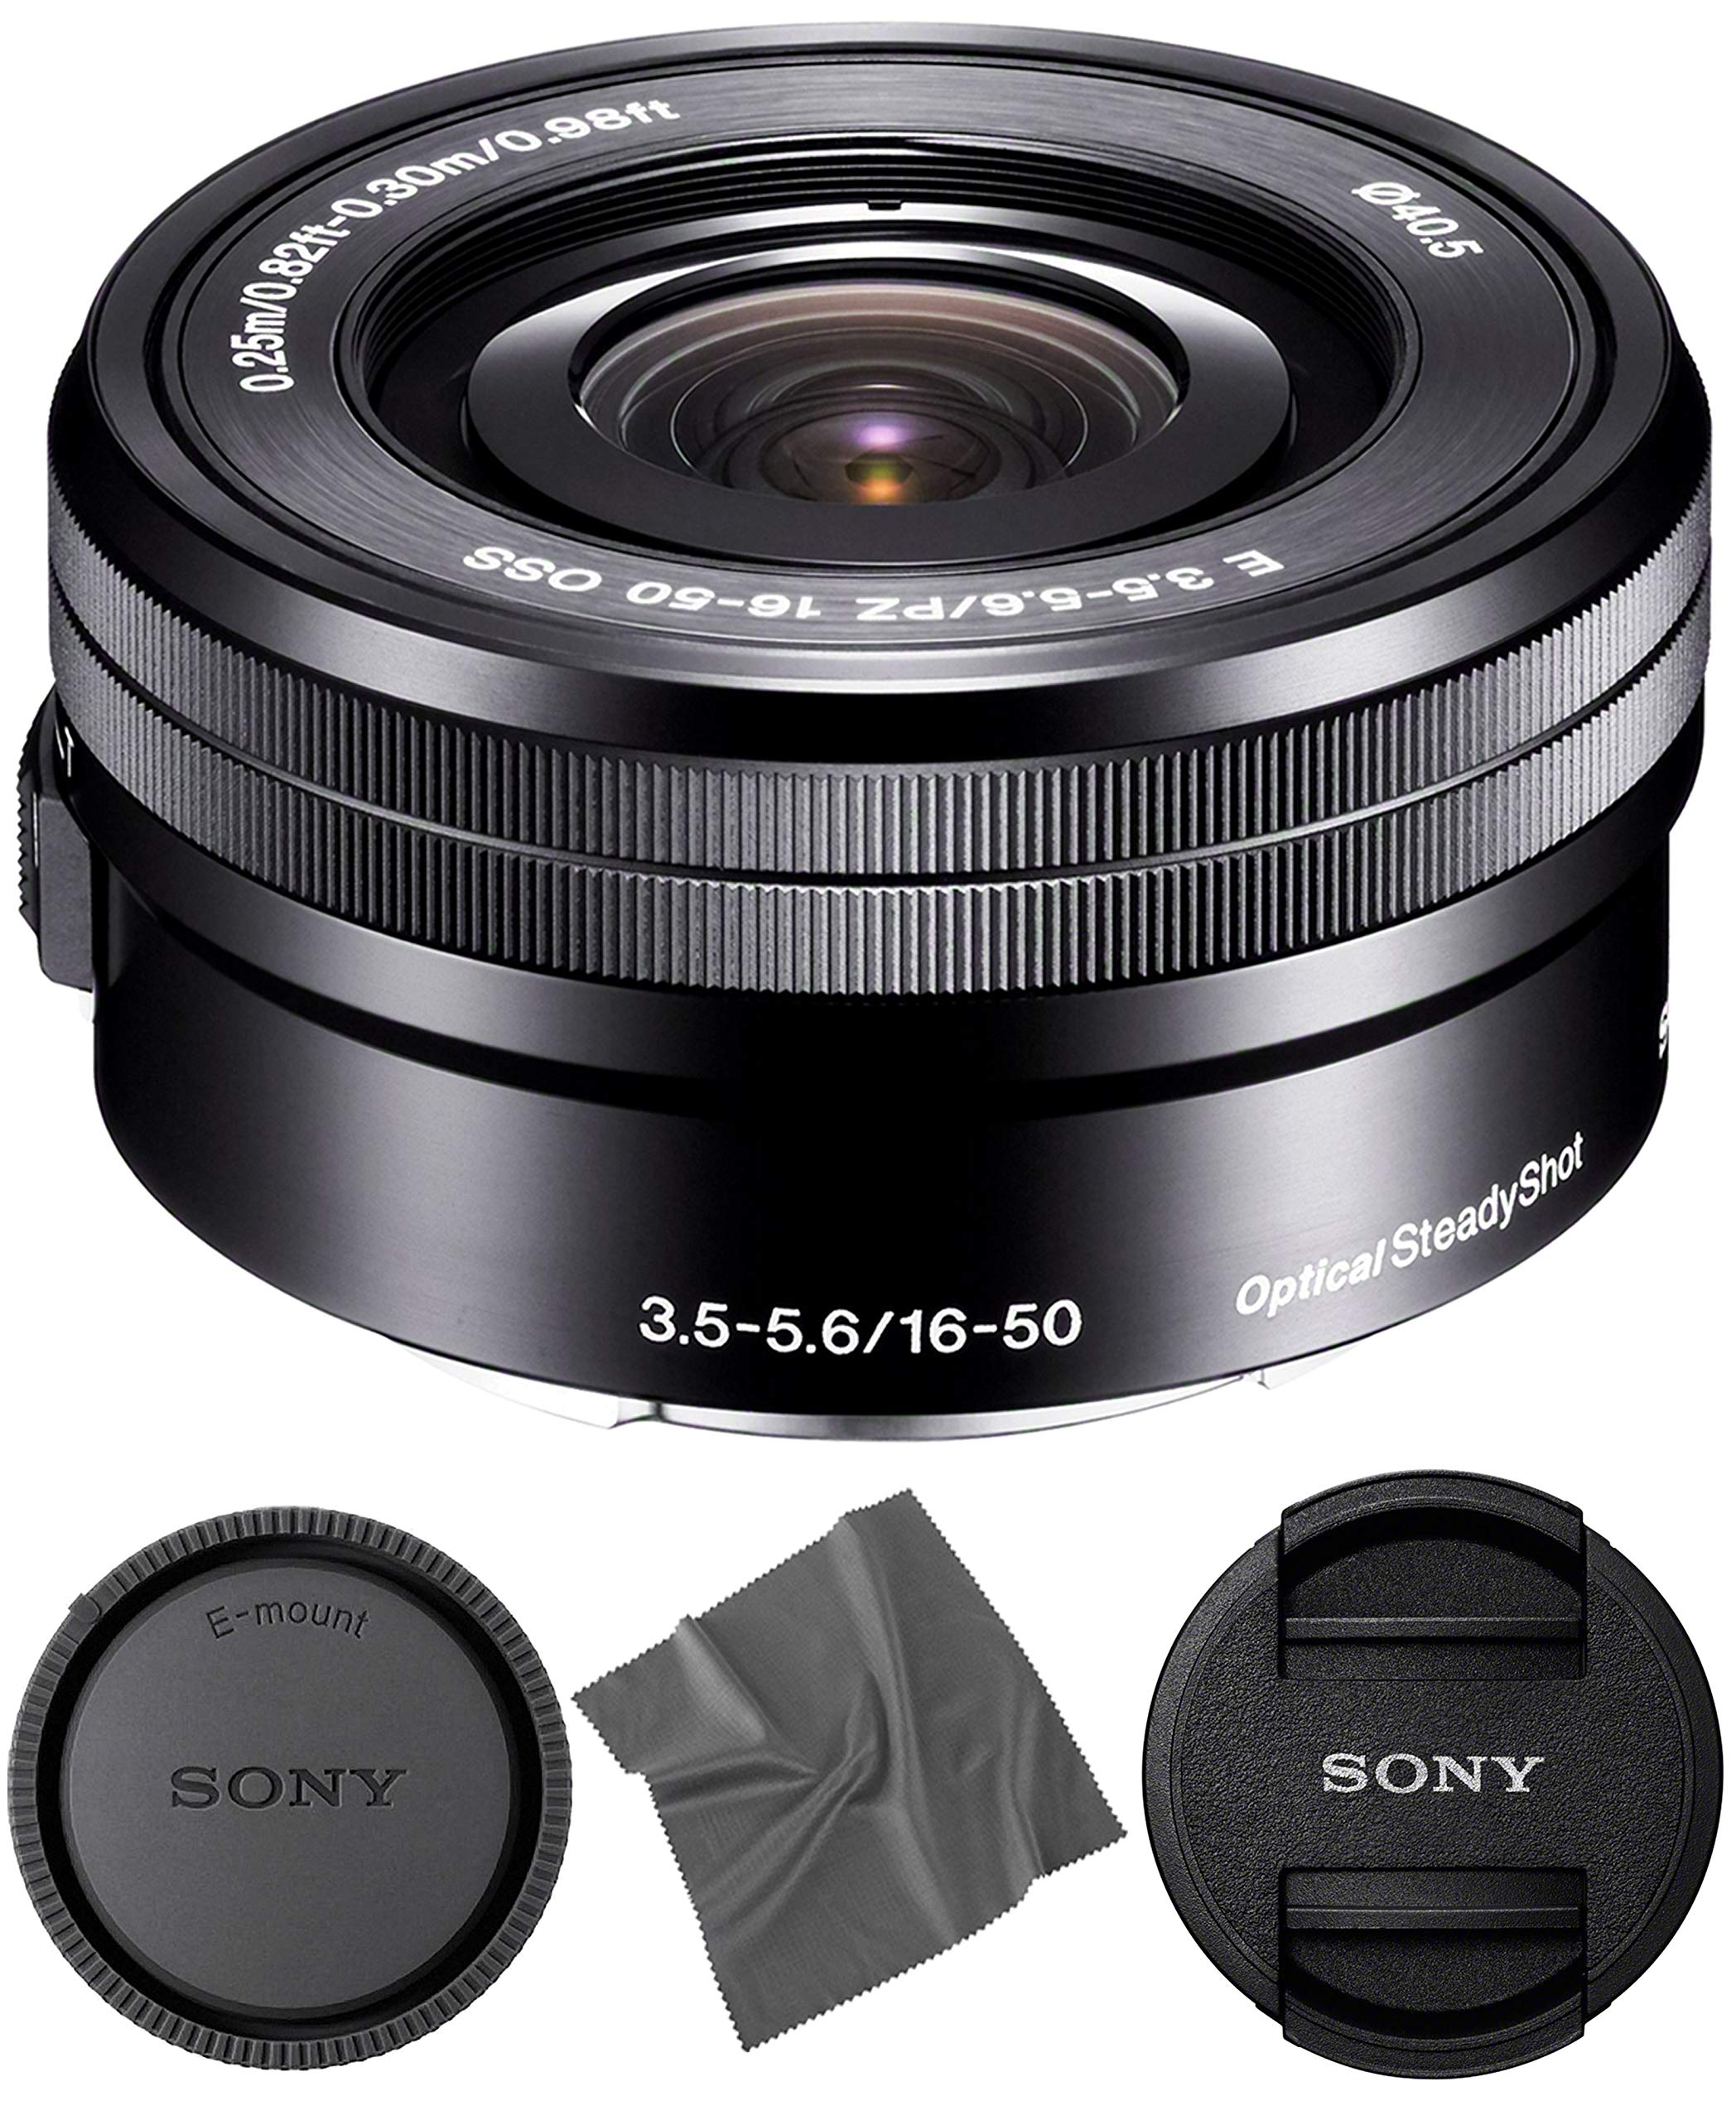 Sony SELP1650 16-50mm OSS Lens: Sony E PZ 16-50mm f/3.5-5.6 OSS Lens (Black) + AOM Pro Starter Bundle Kit Combo - International Version (1 Year AOM Warranty) by AOM